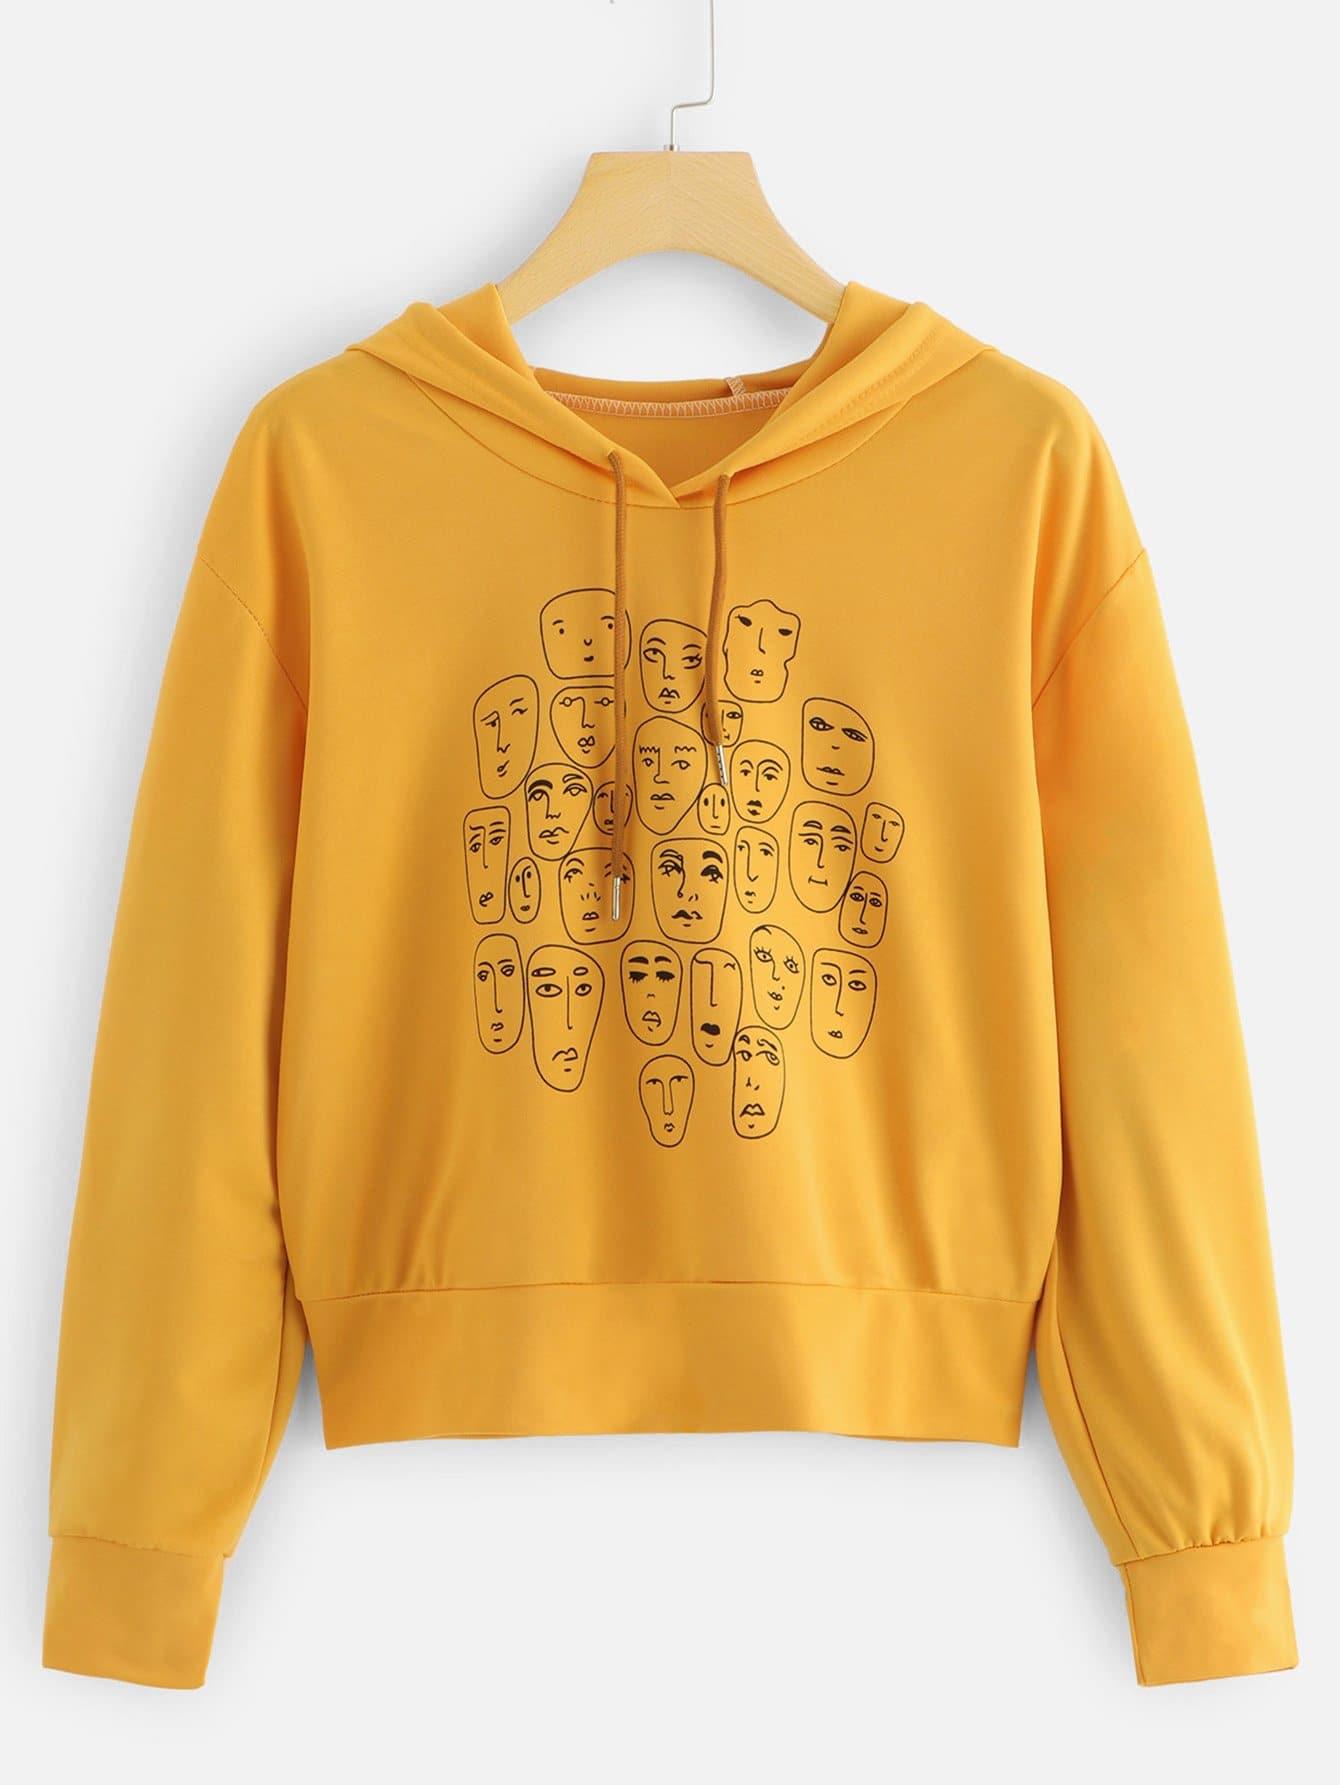 florida-yellow-sweatshirts-size-petite